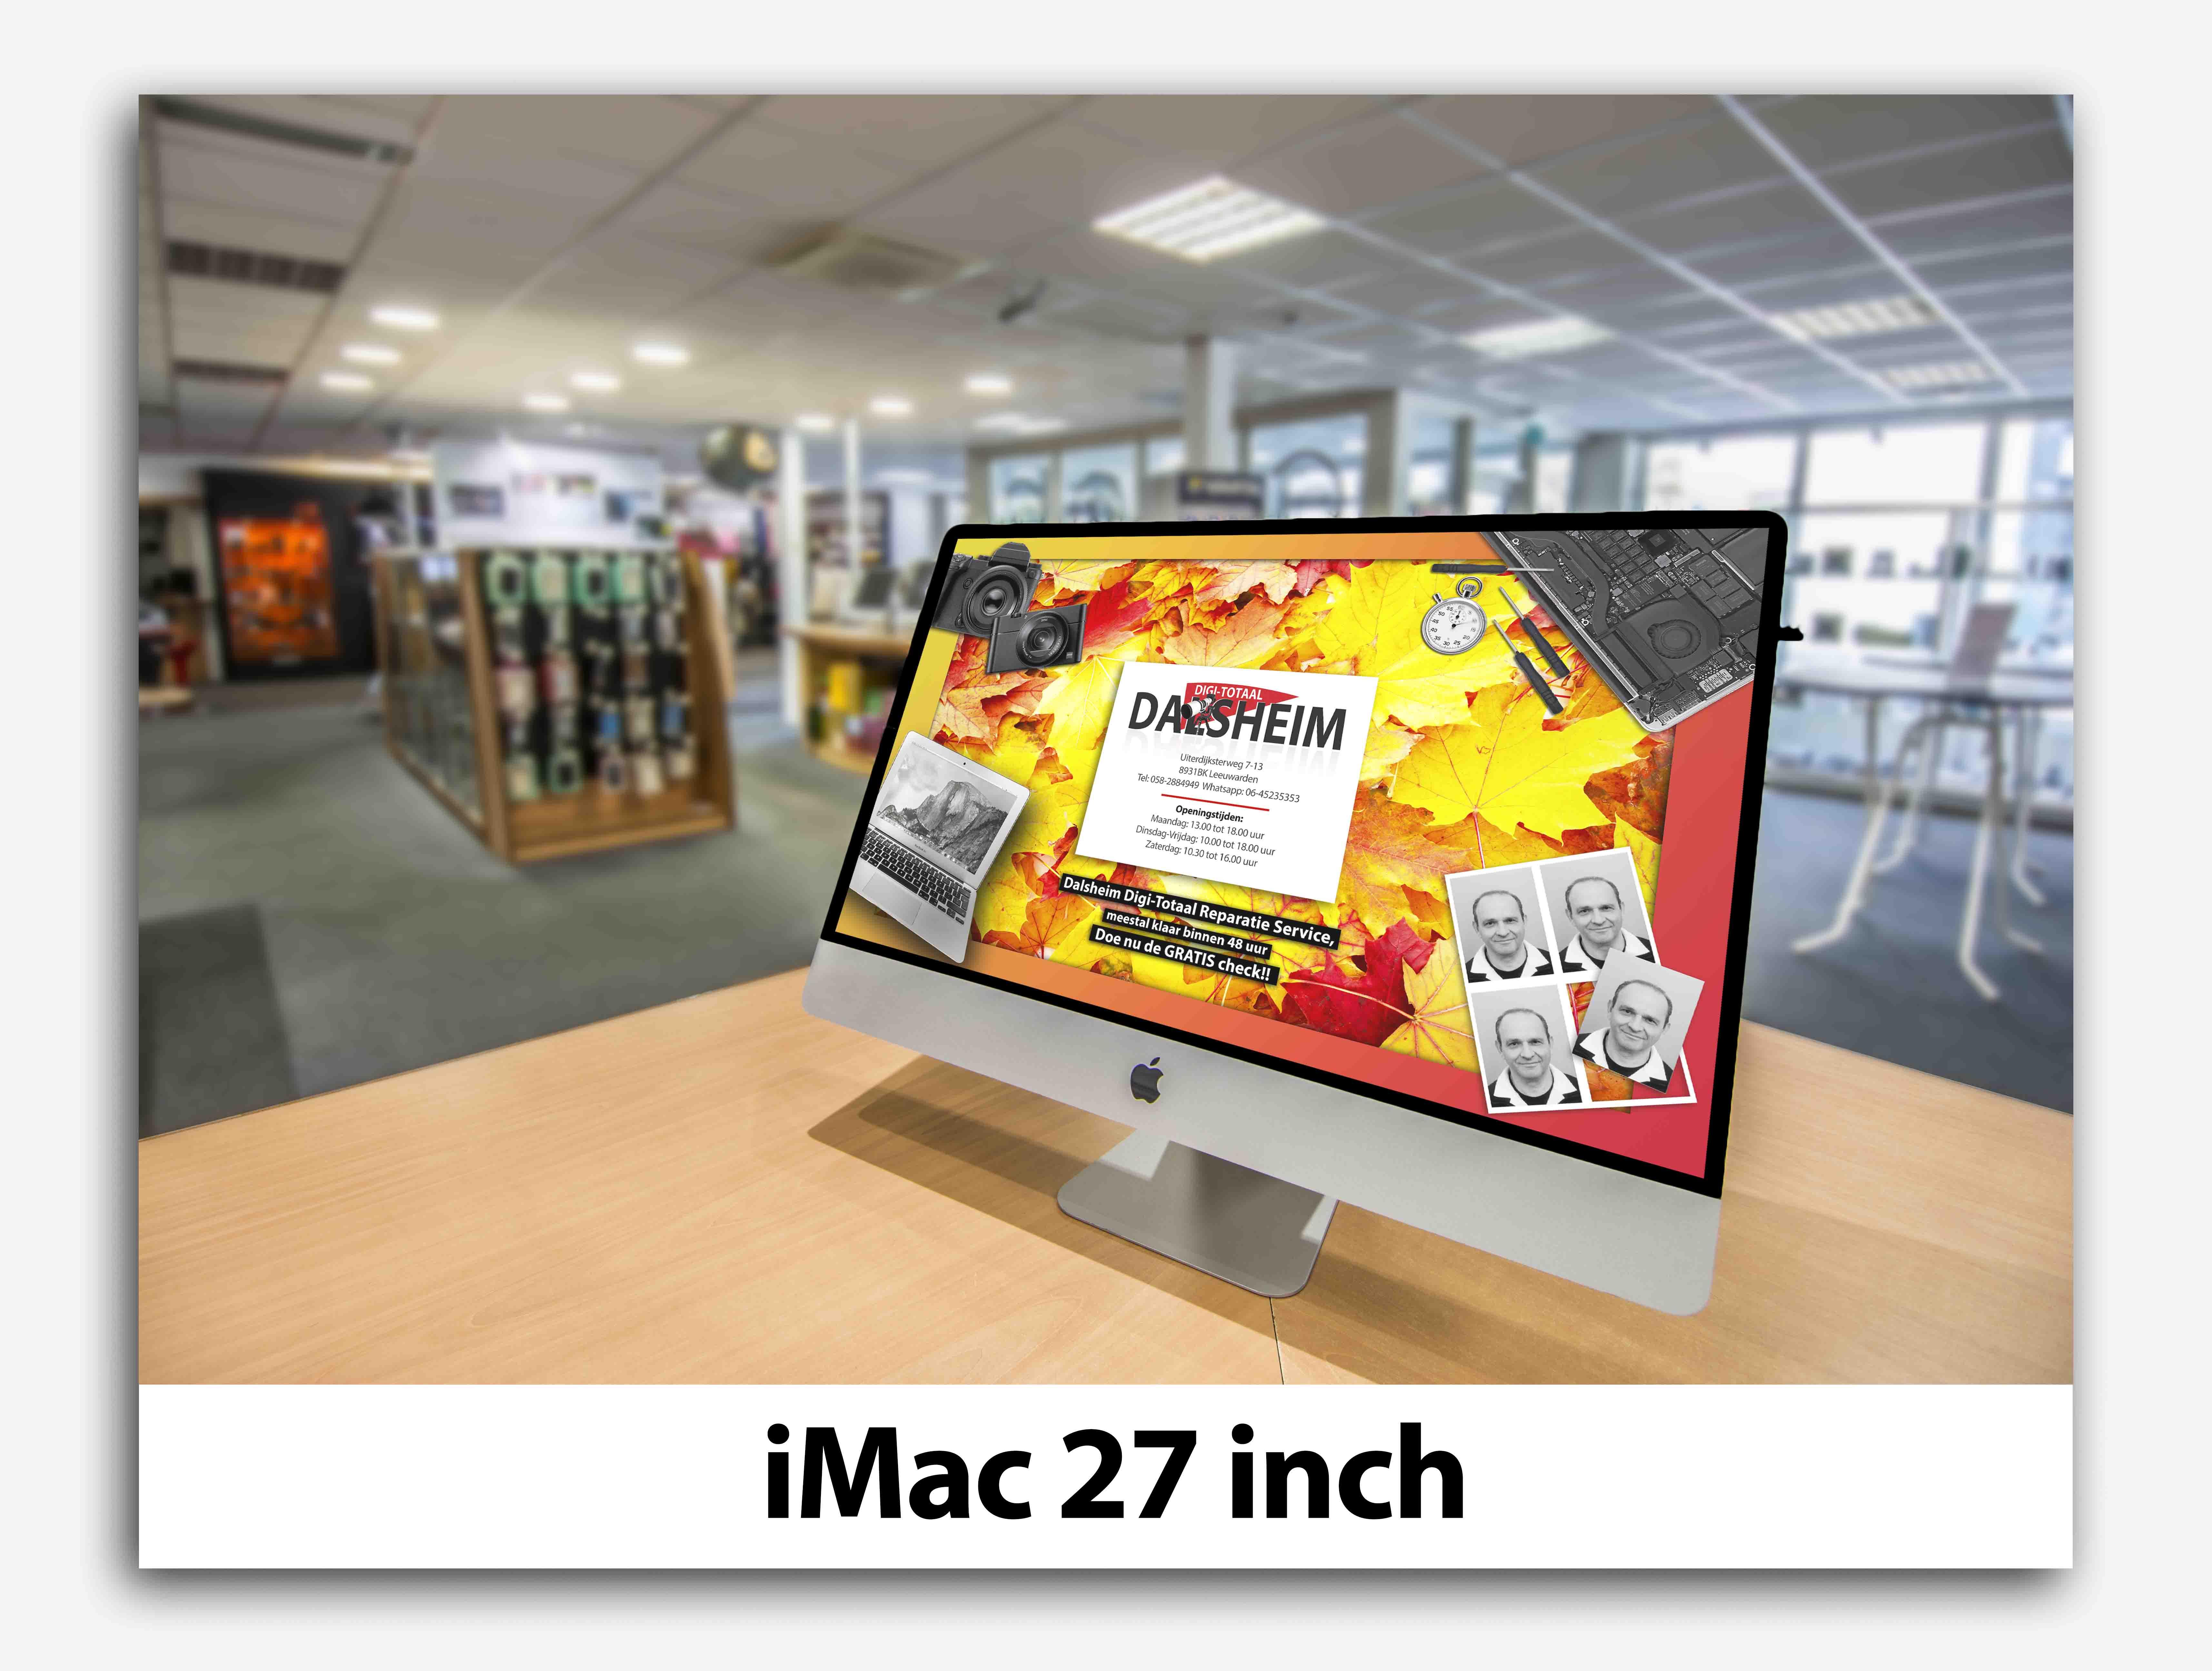 iMac 27 inch apple dalsheim digi-totaal leeuwarden